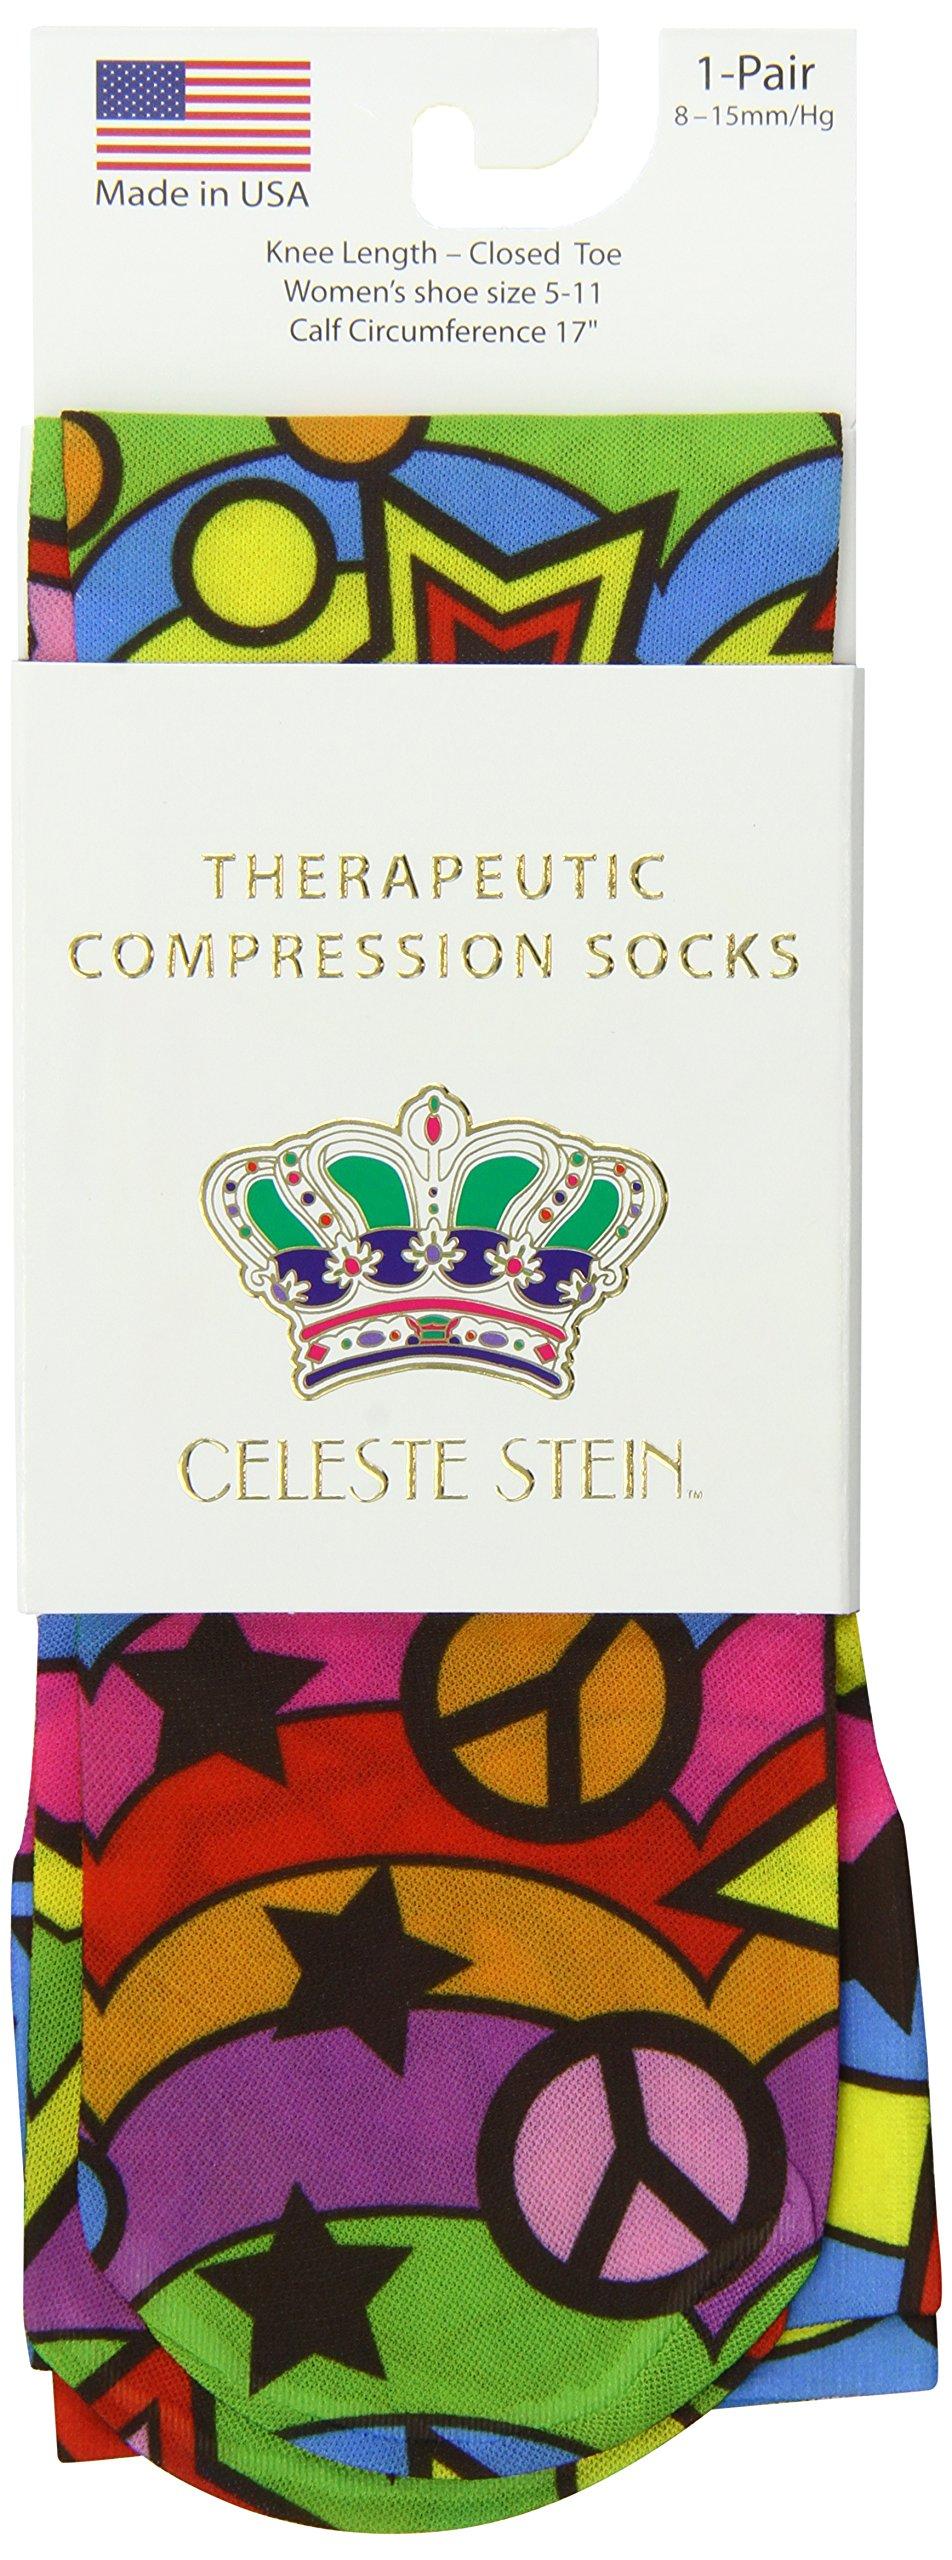 Celeste Stein Therapeutic Compression Socks, Rainbow 60's, 8-15 mmhg.6 Ounce